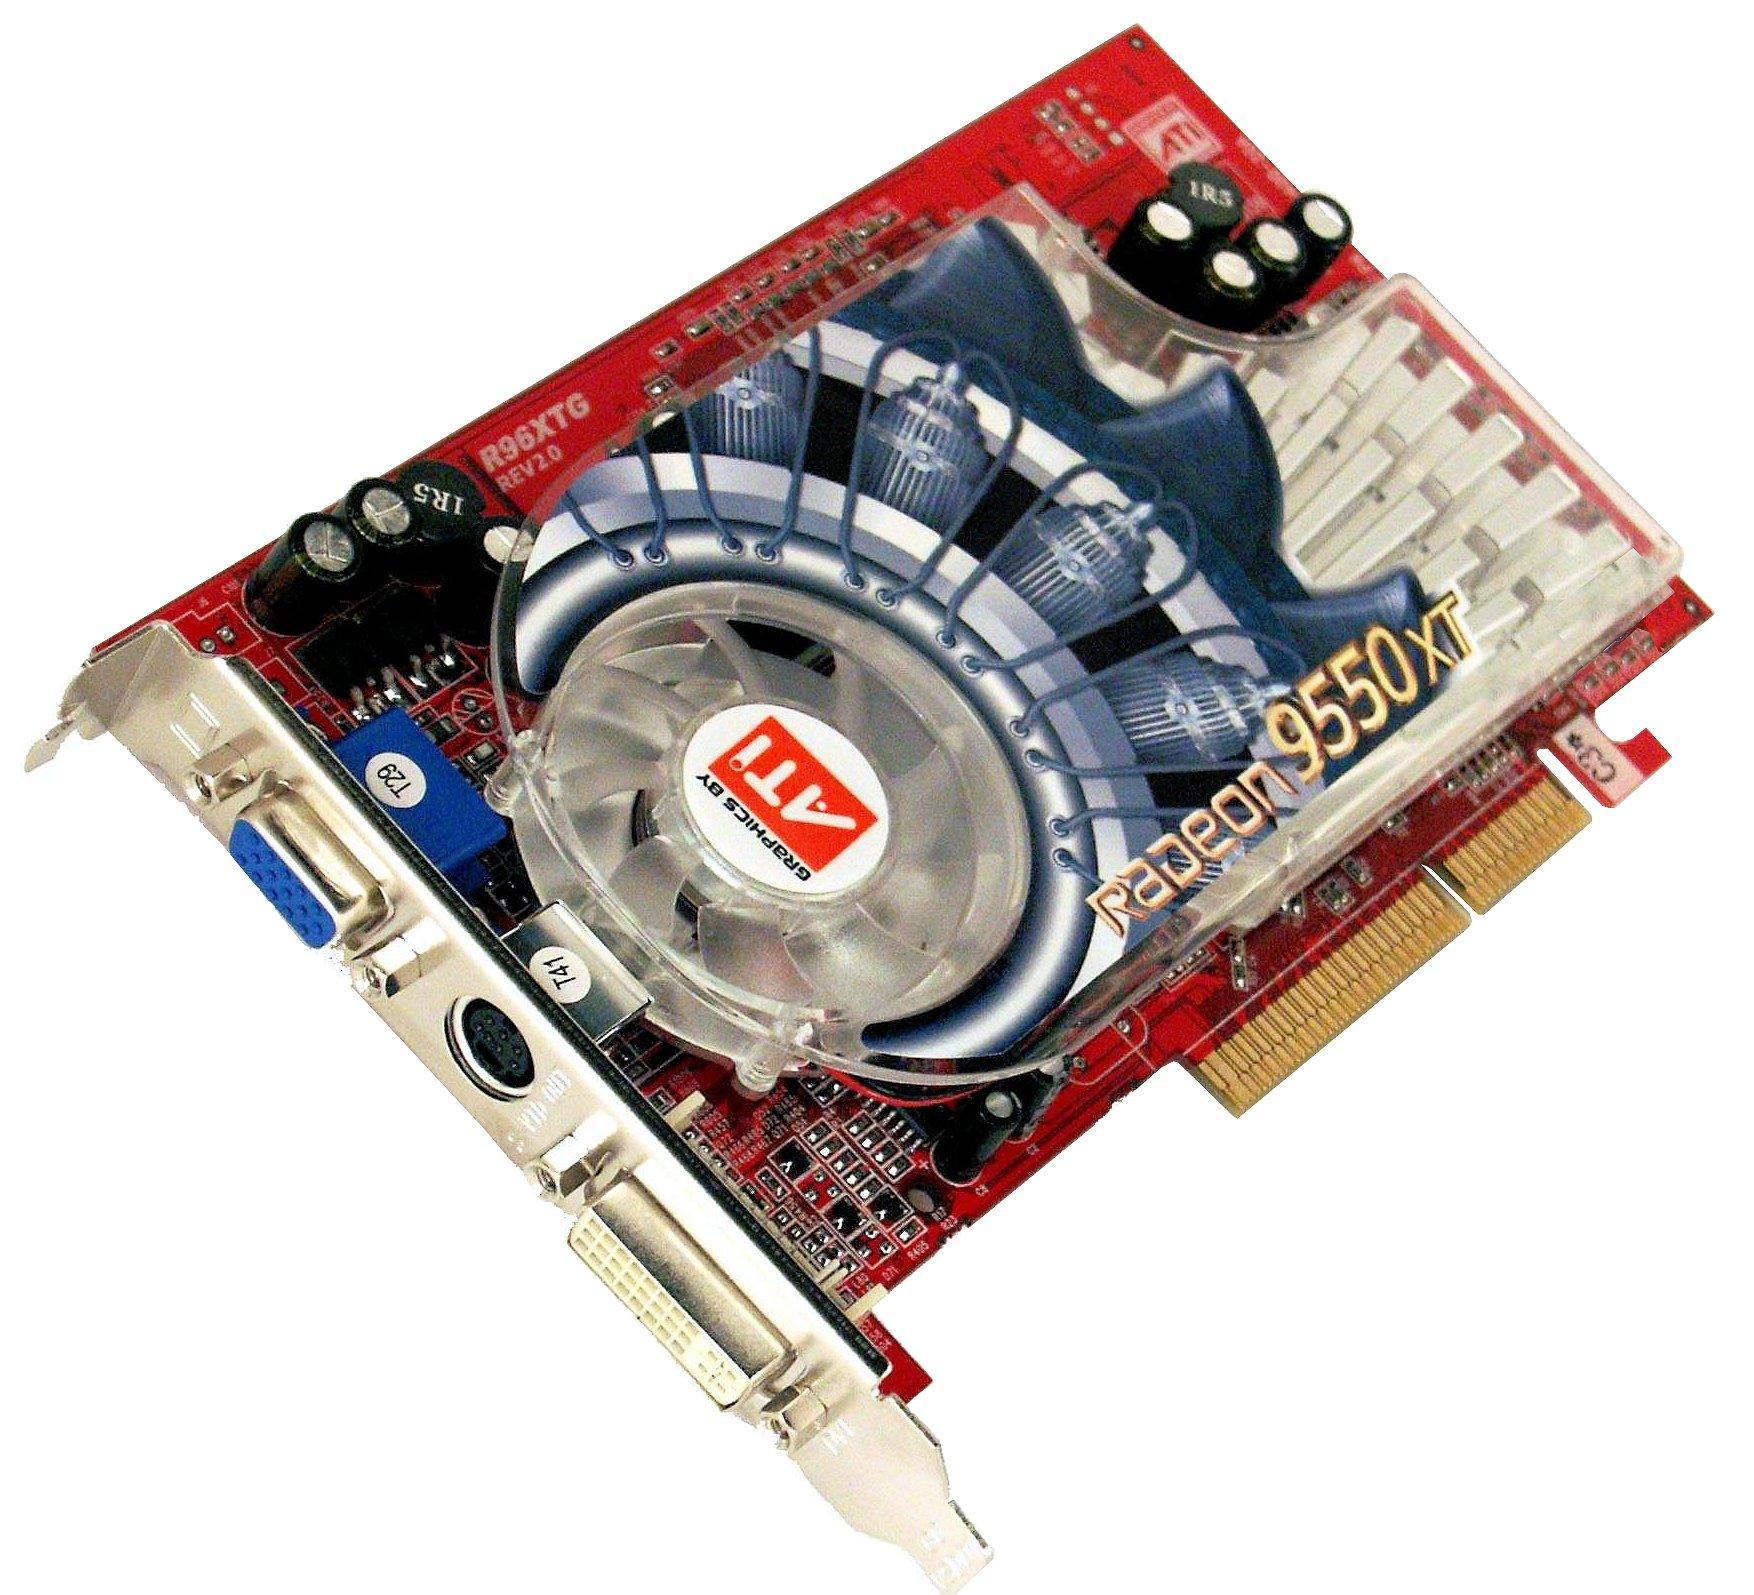 ATI 3DP GeXCube Radeon 9600XT 64 BIT Driver